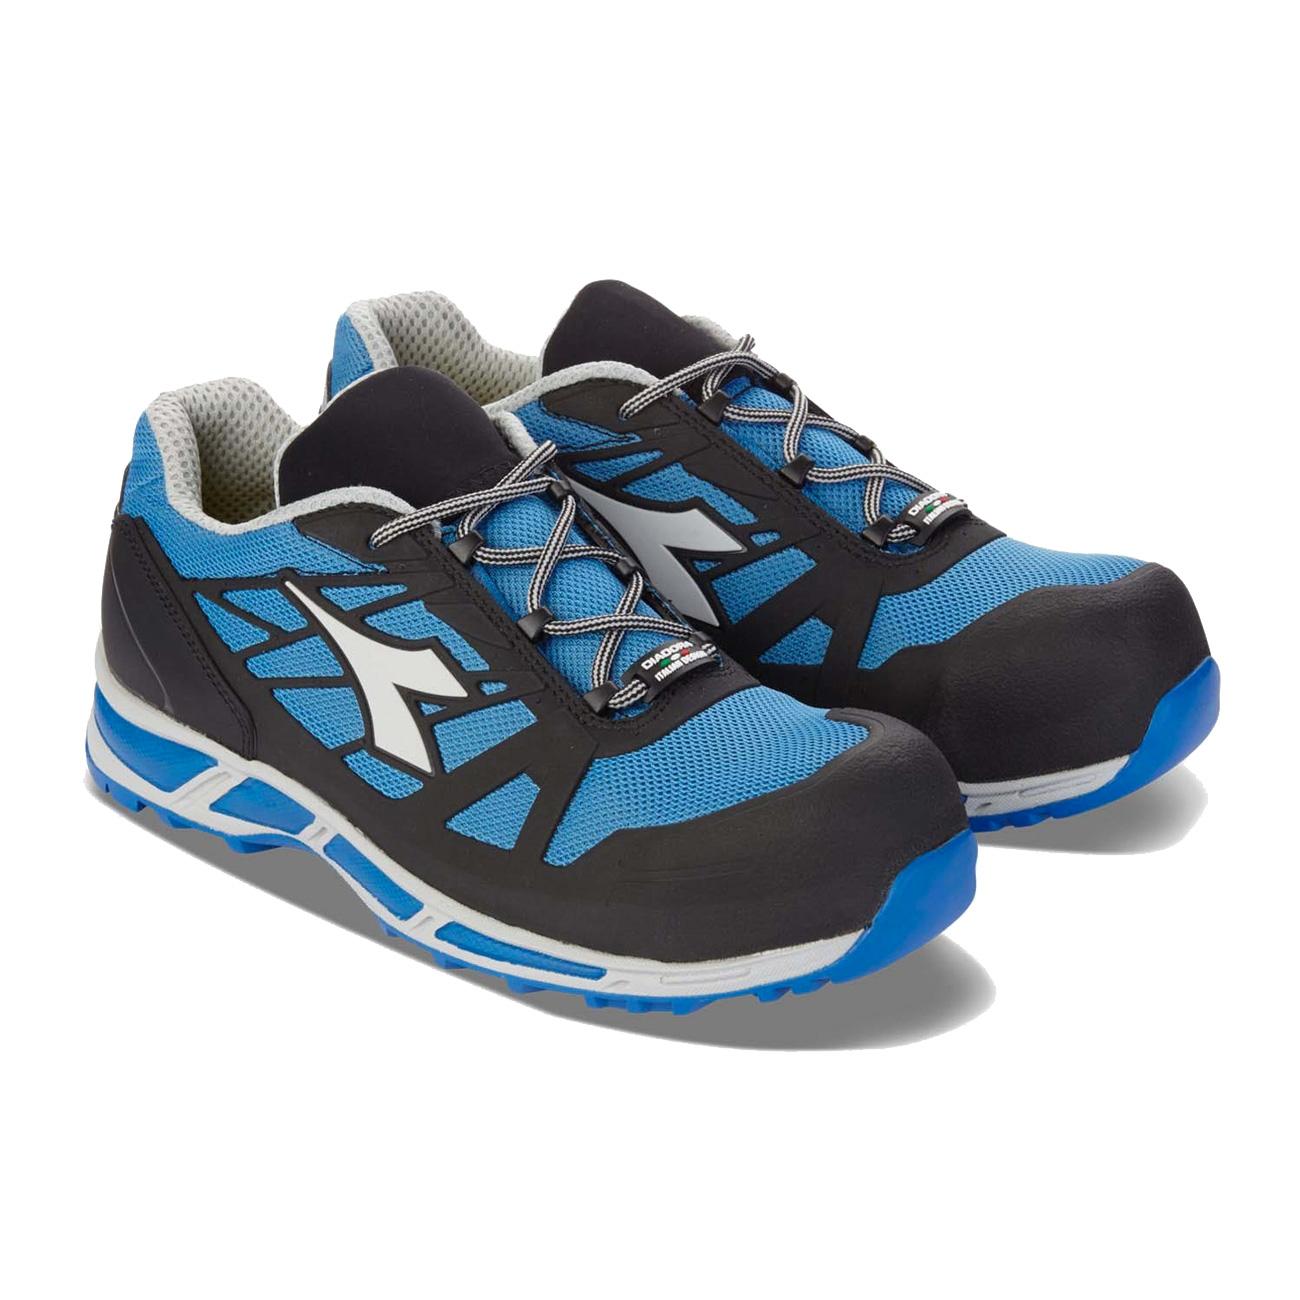 M Dc Neri Shoe Shoes 5alr3j4 Qcxorbdew Bt0 Bridge Camoscio Amazon WDEIH29Y